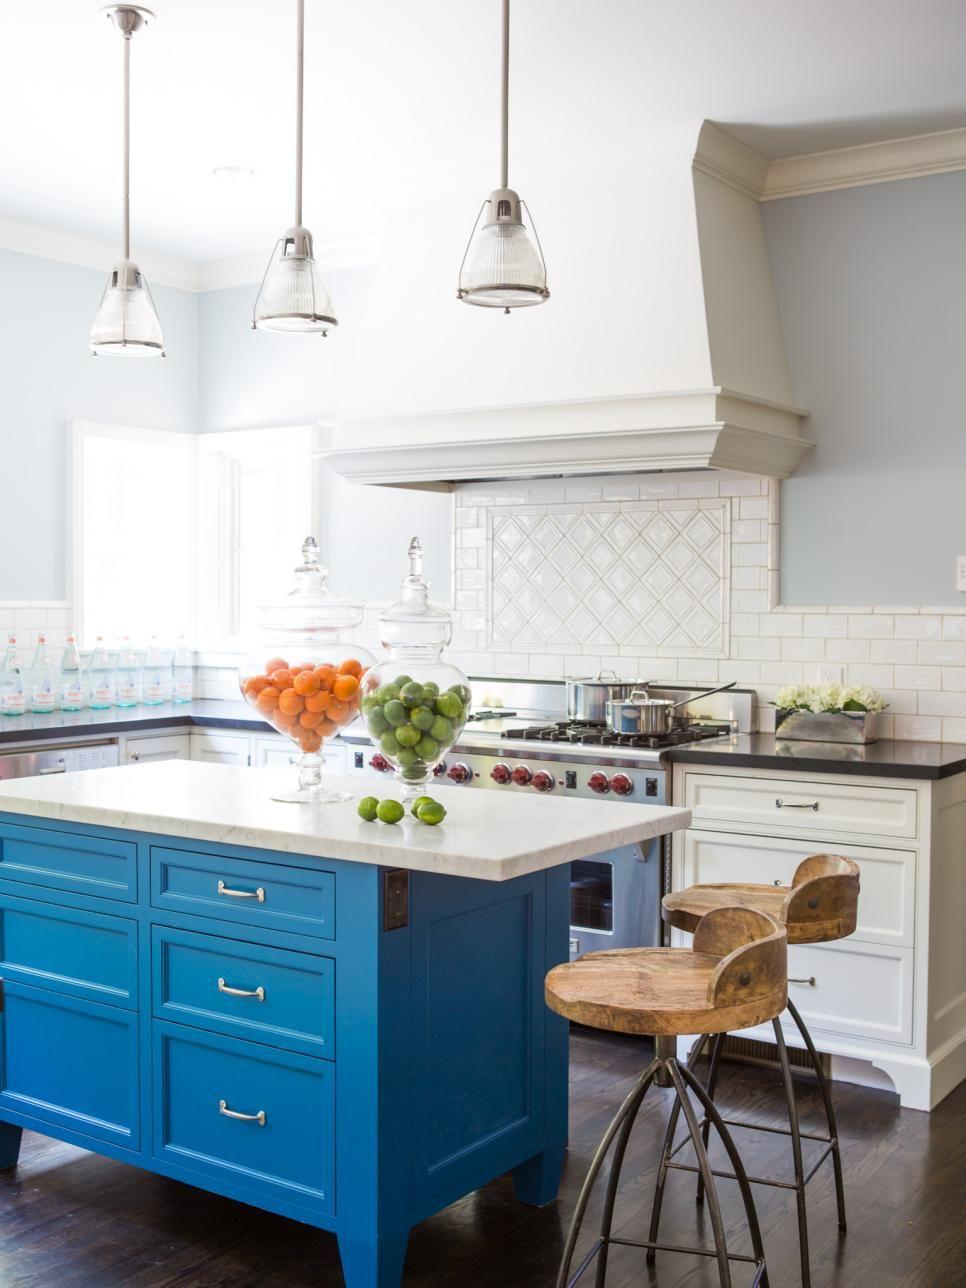 20 Dreamy Kitchen Islands Beautiful Backsplash Ideas Blue